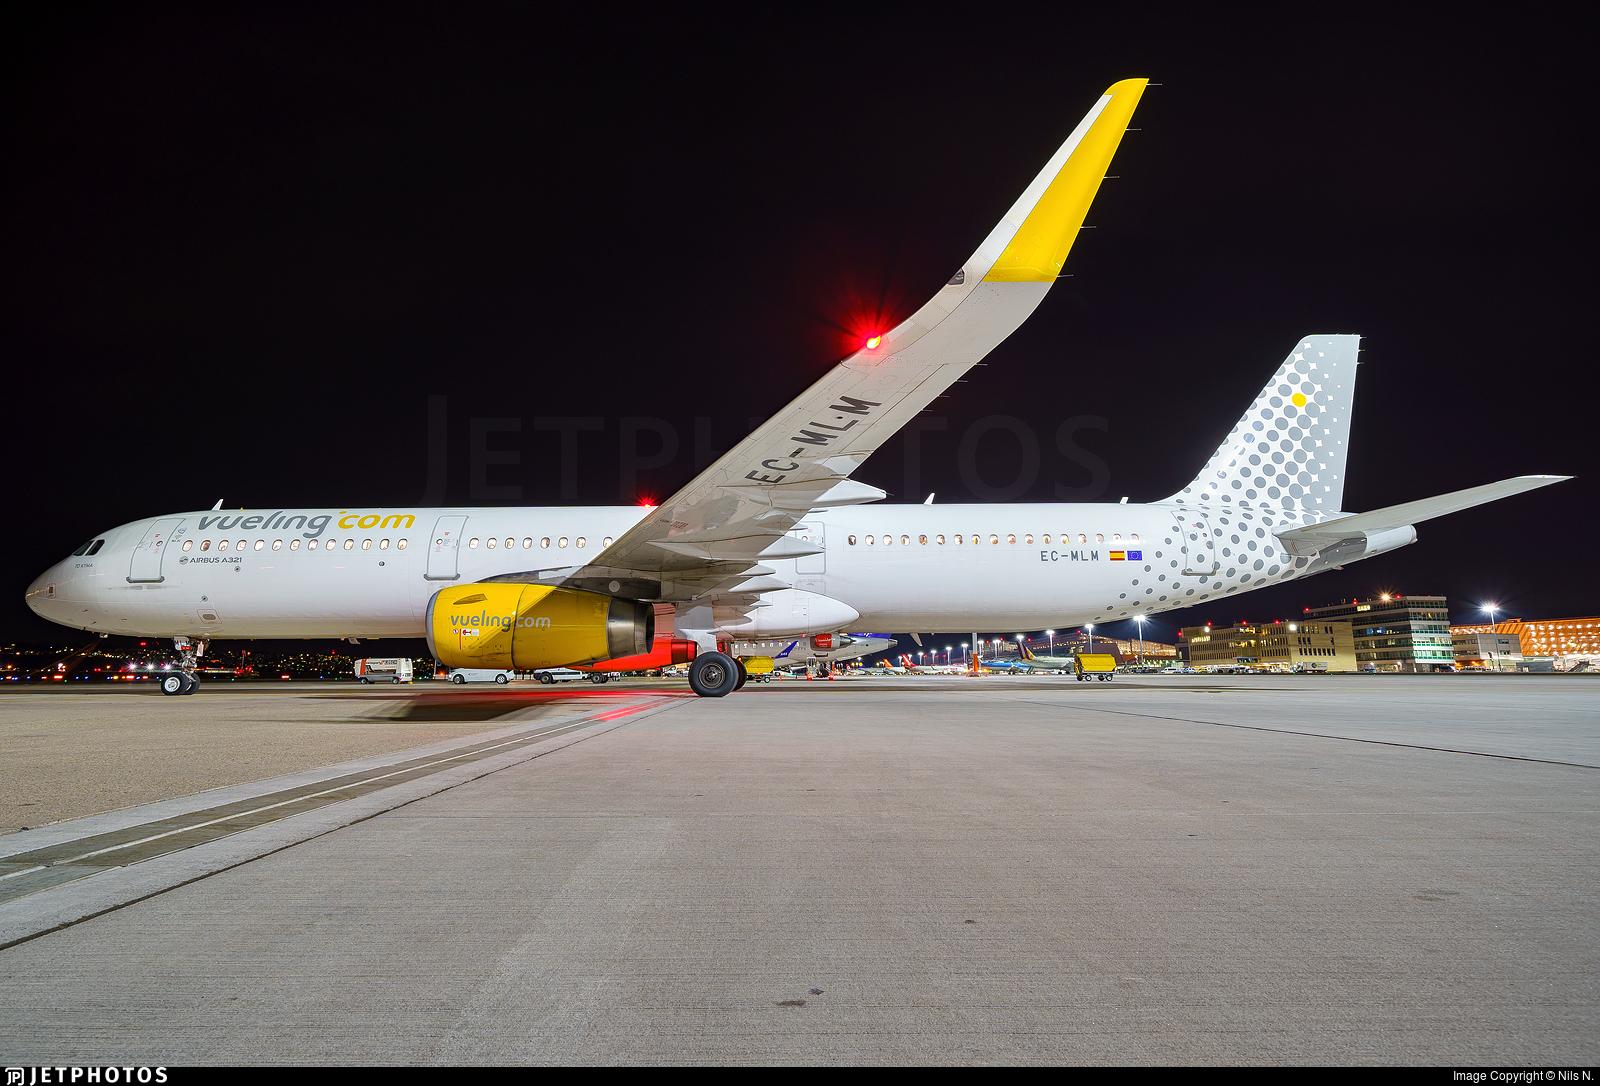 EC-MLM - Airbus A321-231 - Vueling